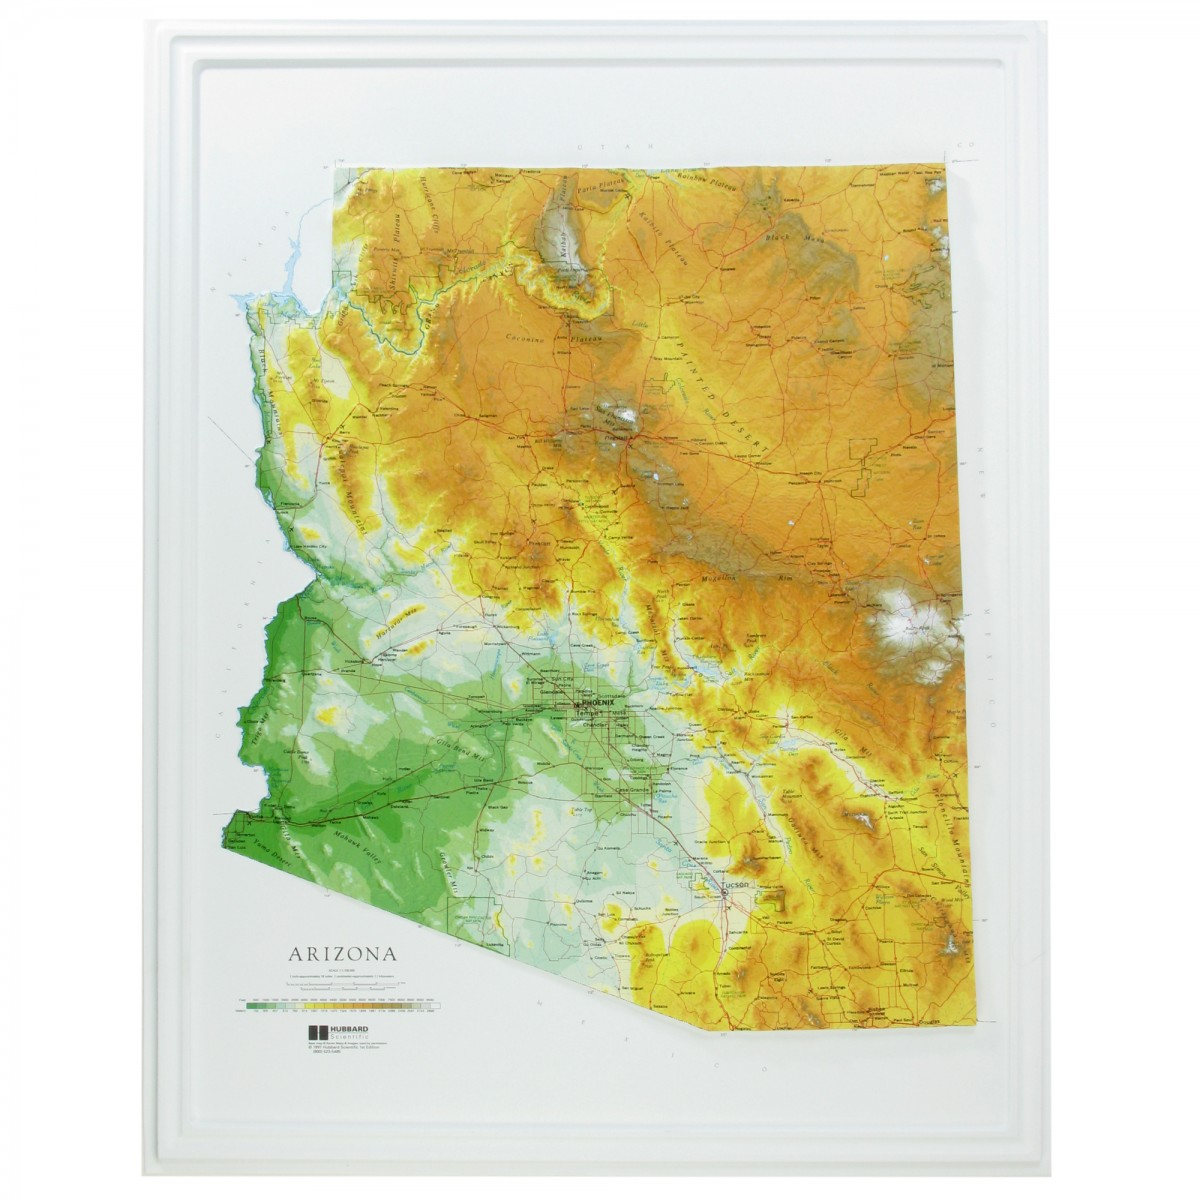 3d Map Of Arizona.Raised Relief 3d Map Of Arizona